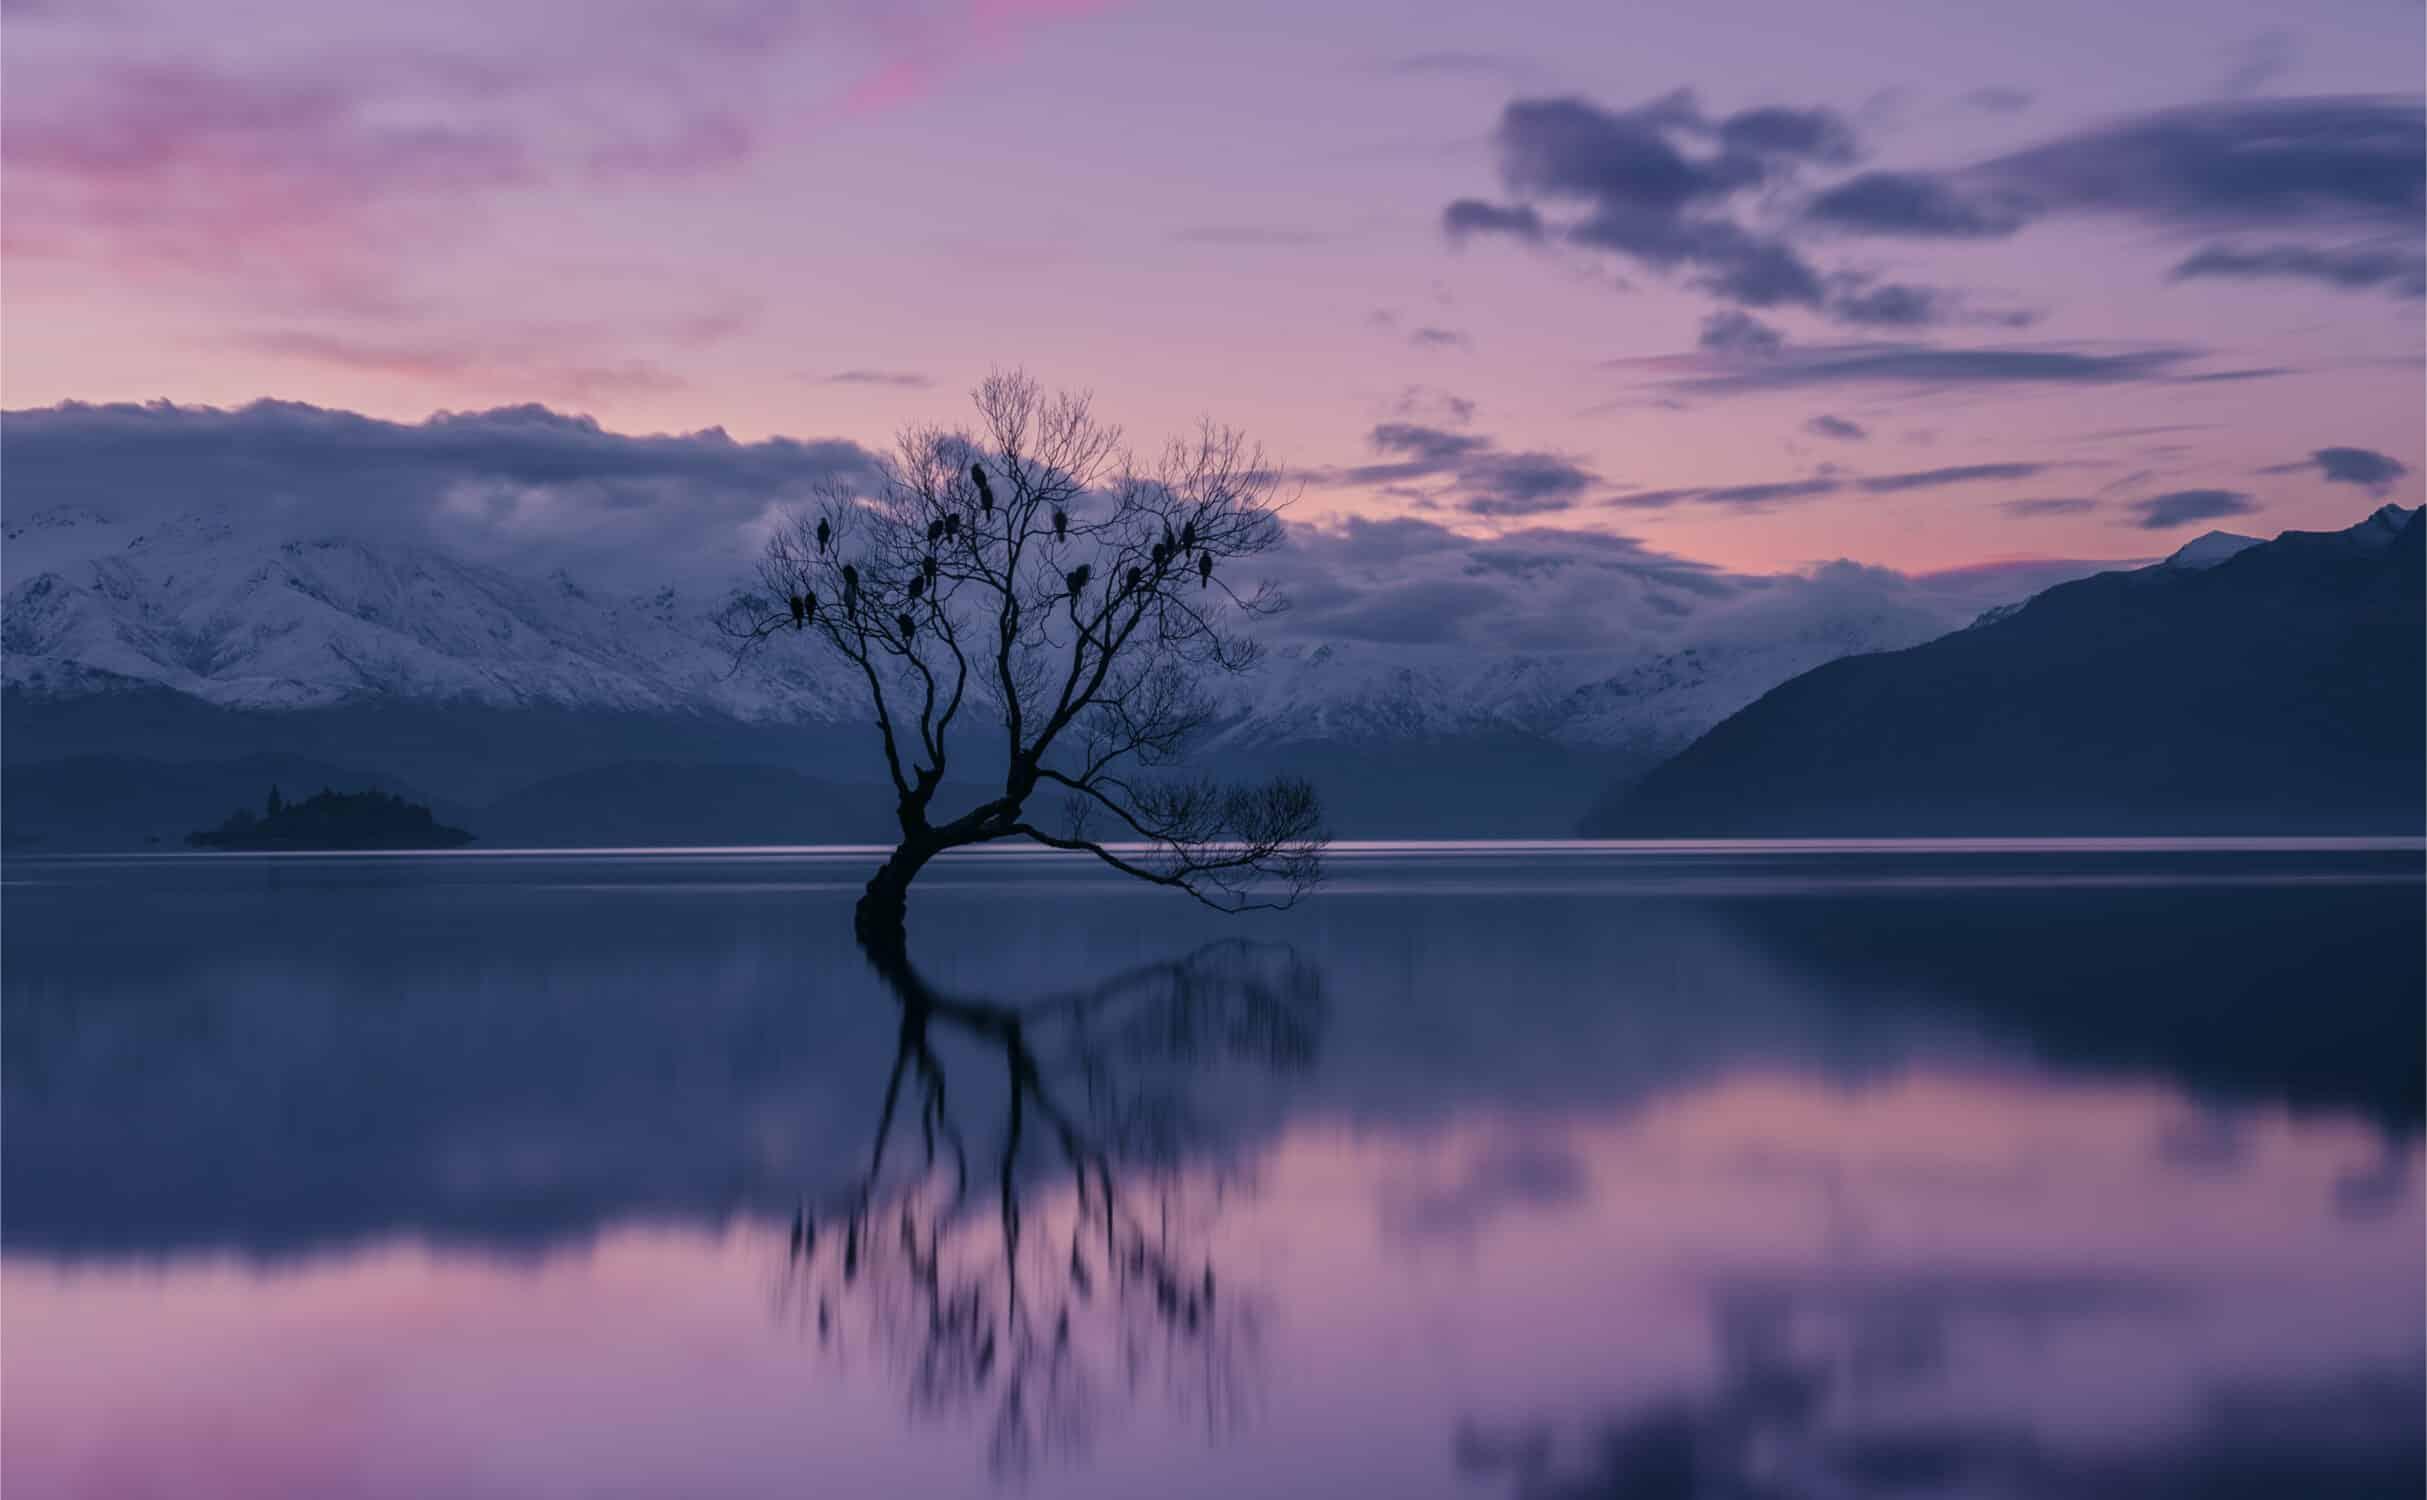 Wanaka Tree im Lake Wanaka